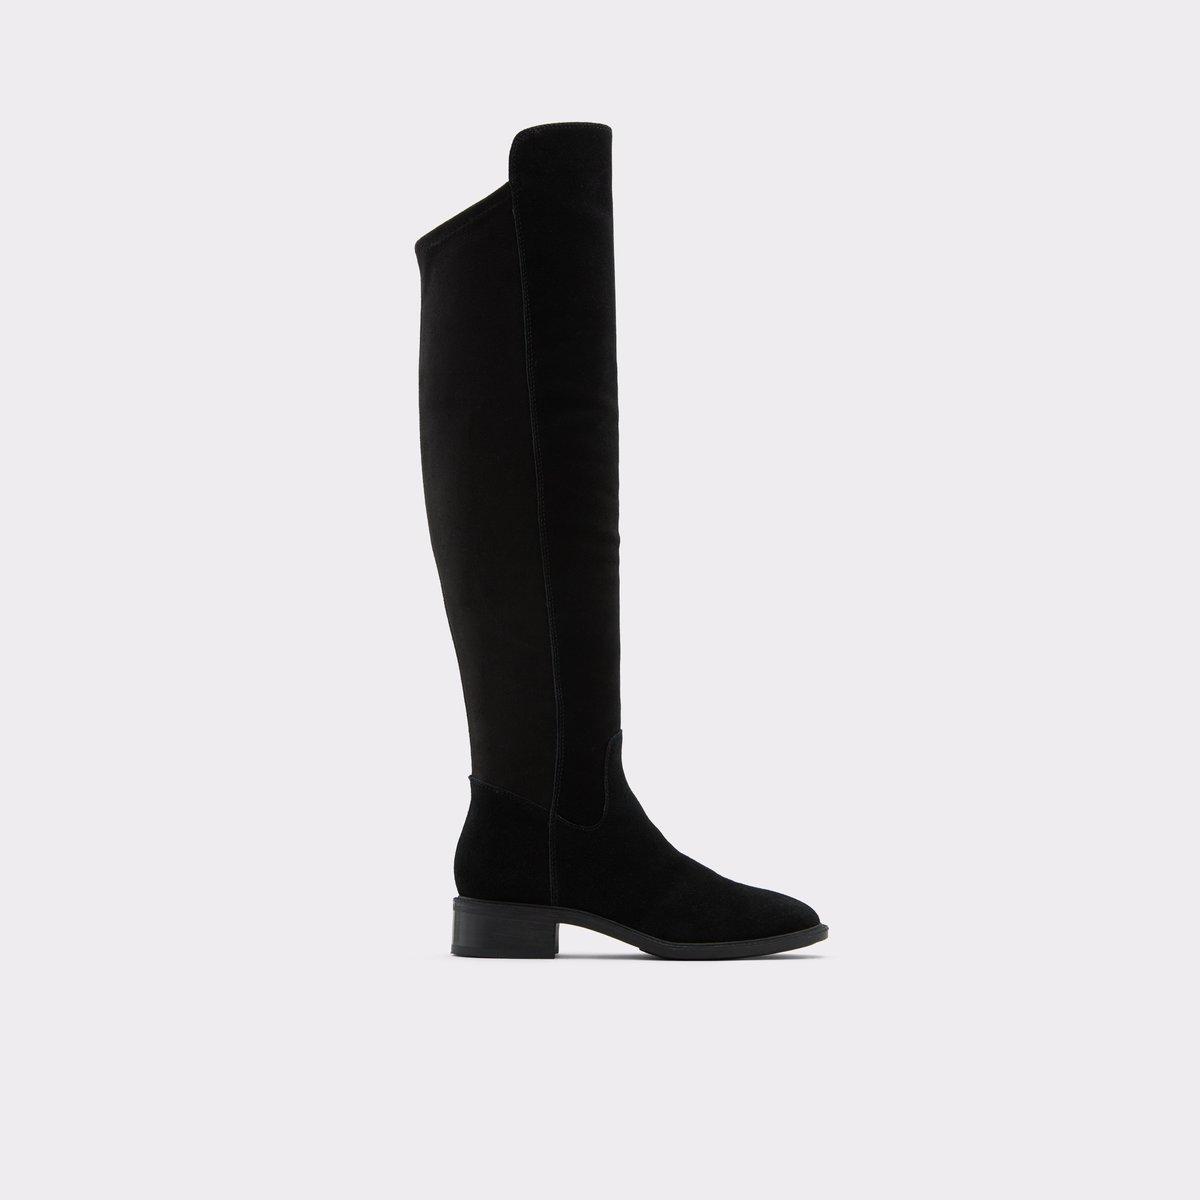 Byssa Black Leather Suede Women's Knee